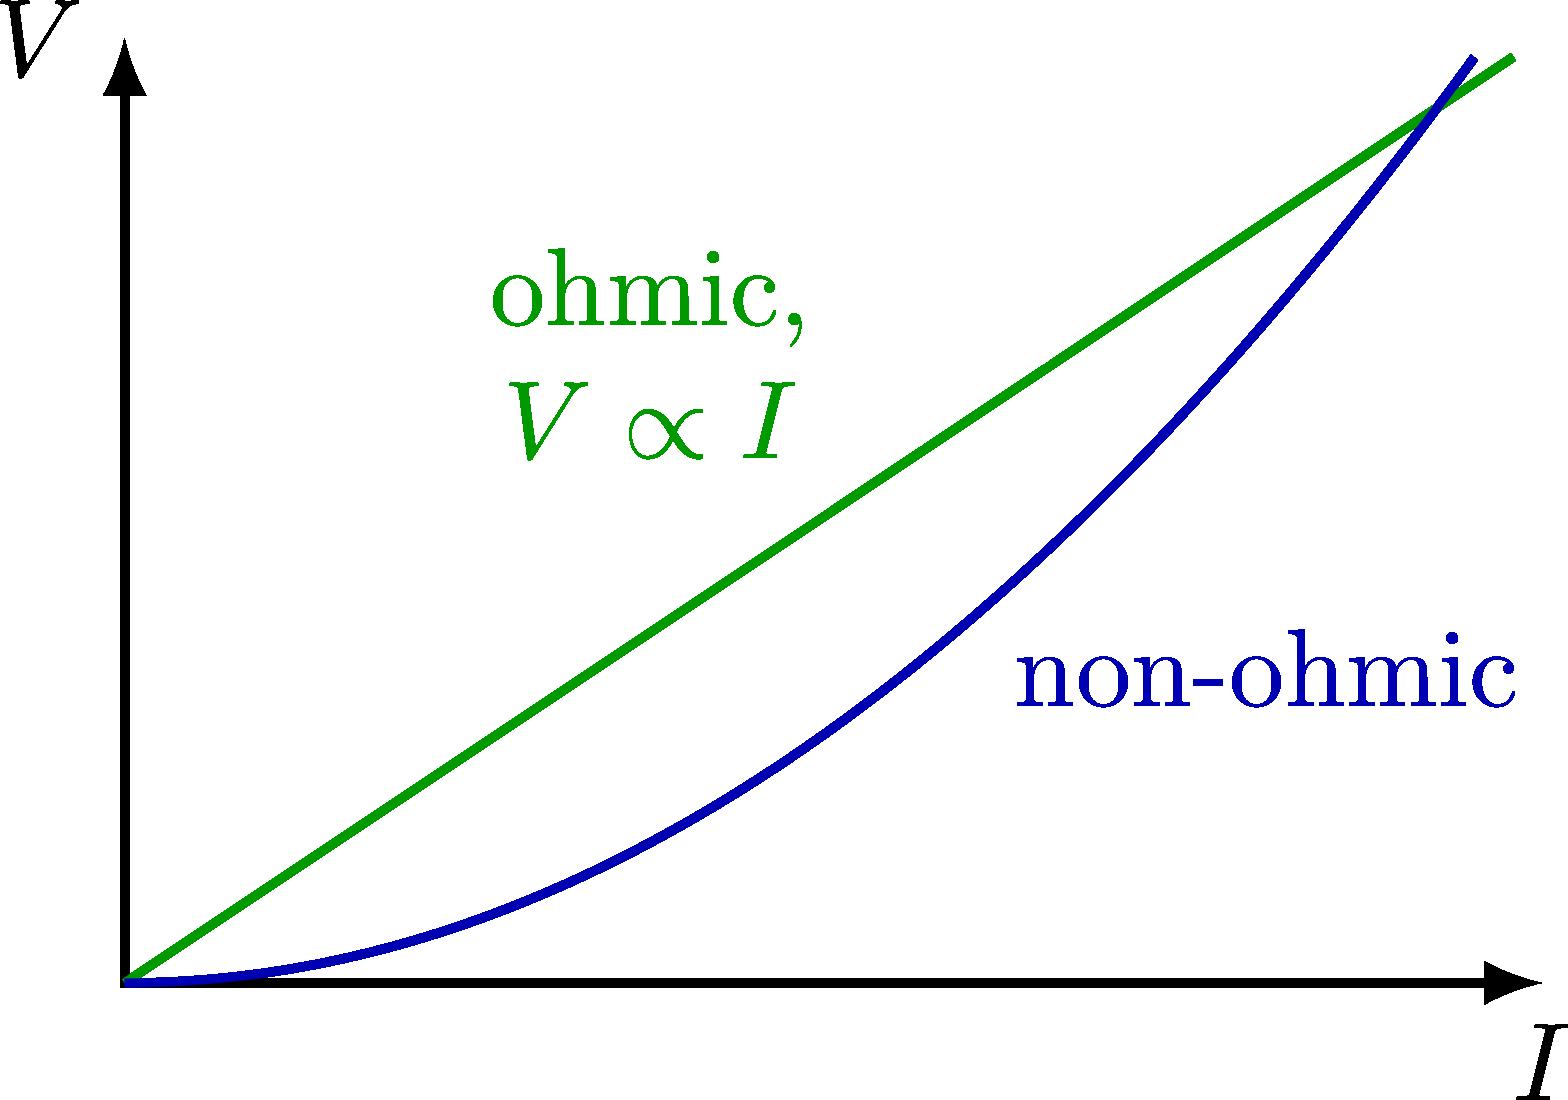 electric_circuit_plots-001.png